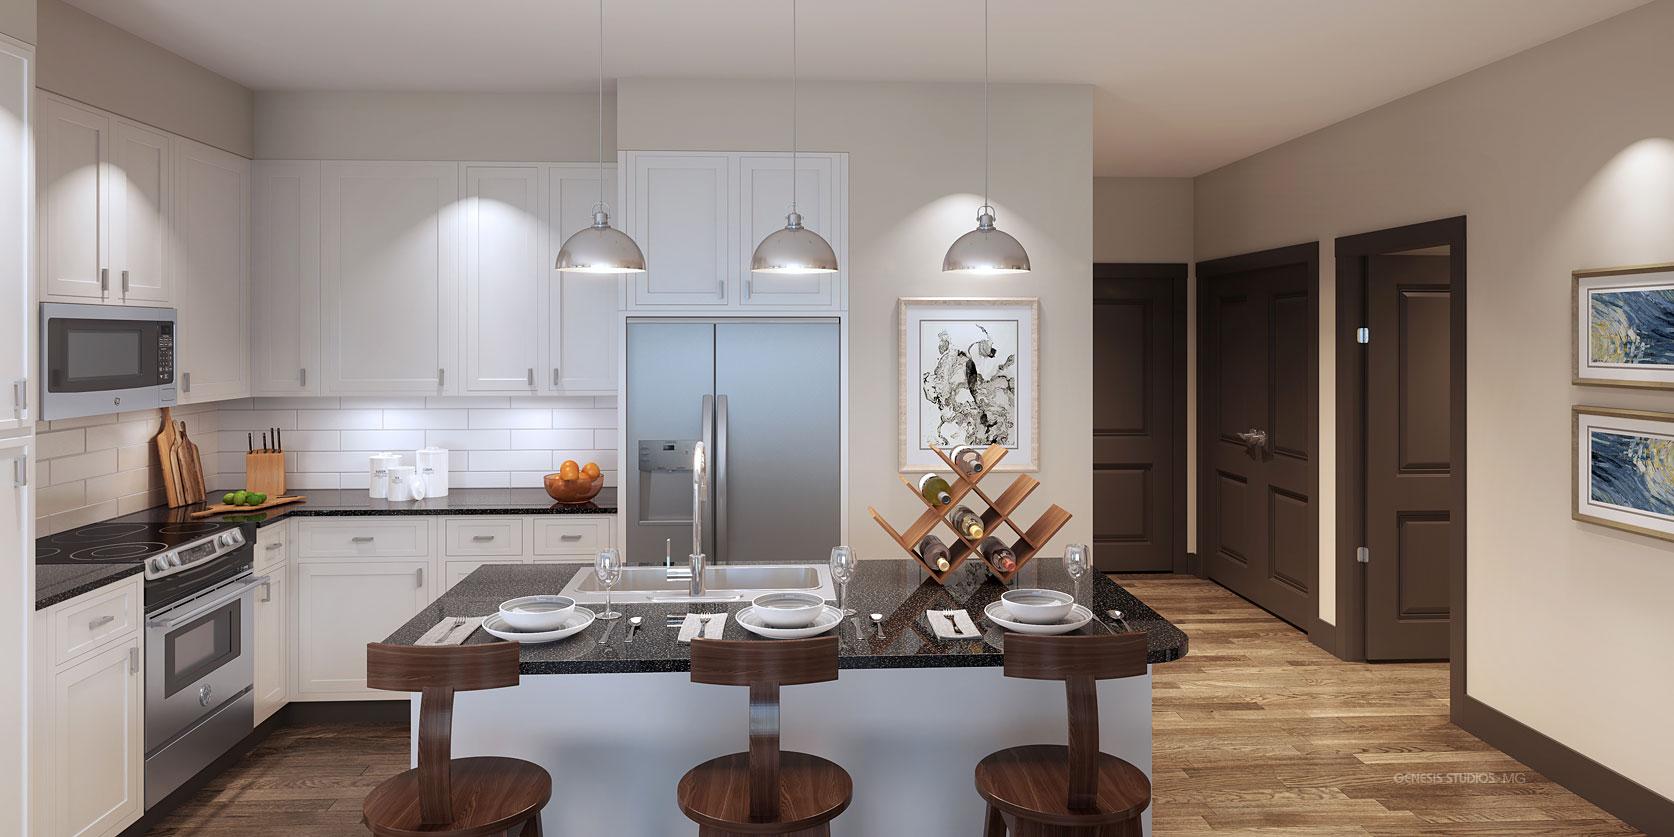 3D Multi-Family Home Interior Renderings of Round Rock Kitchen for LIV Development